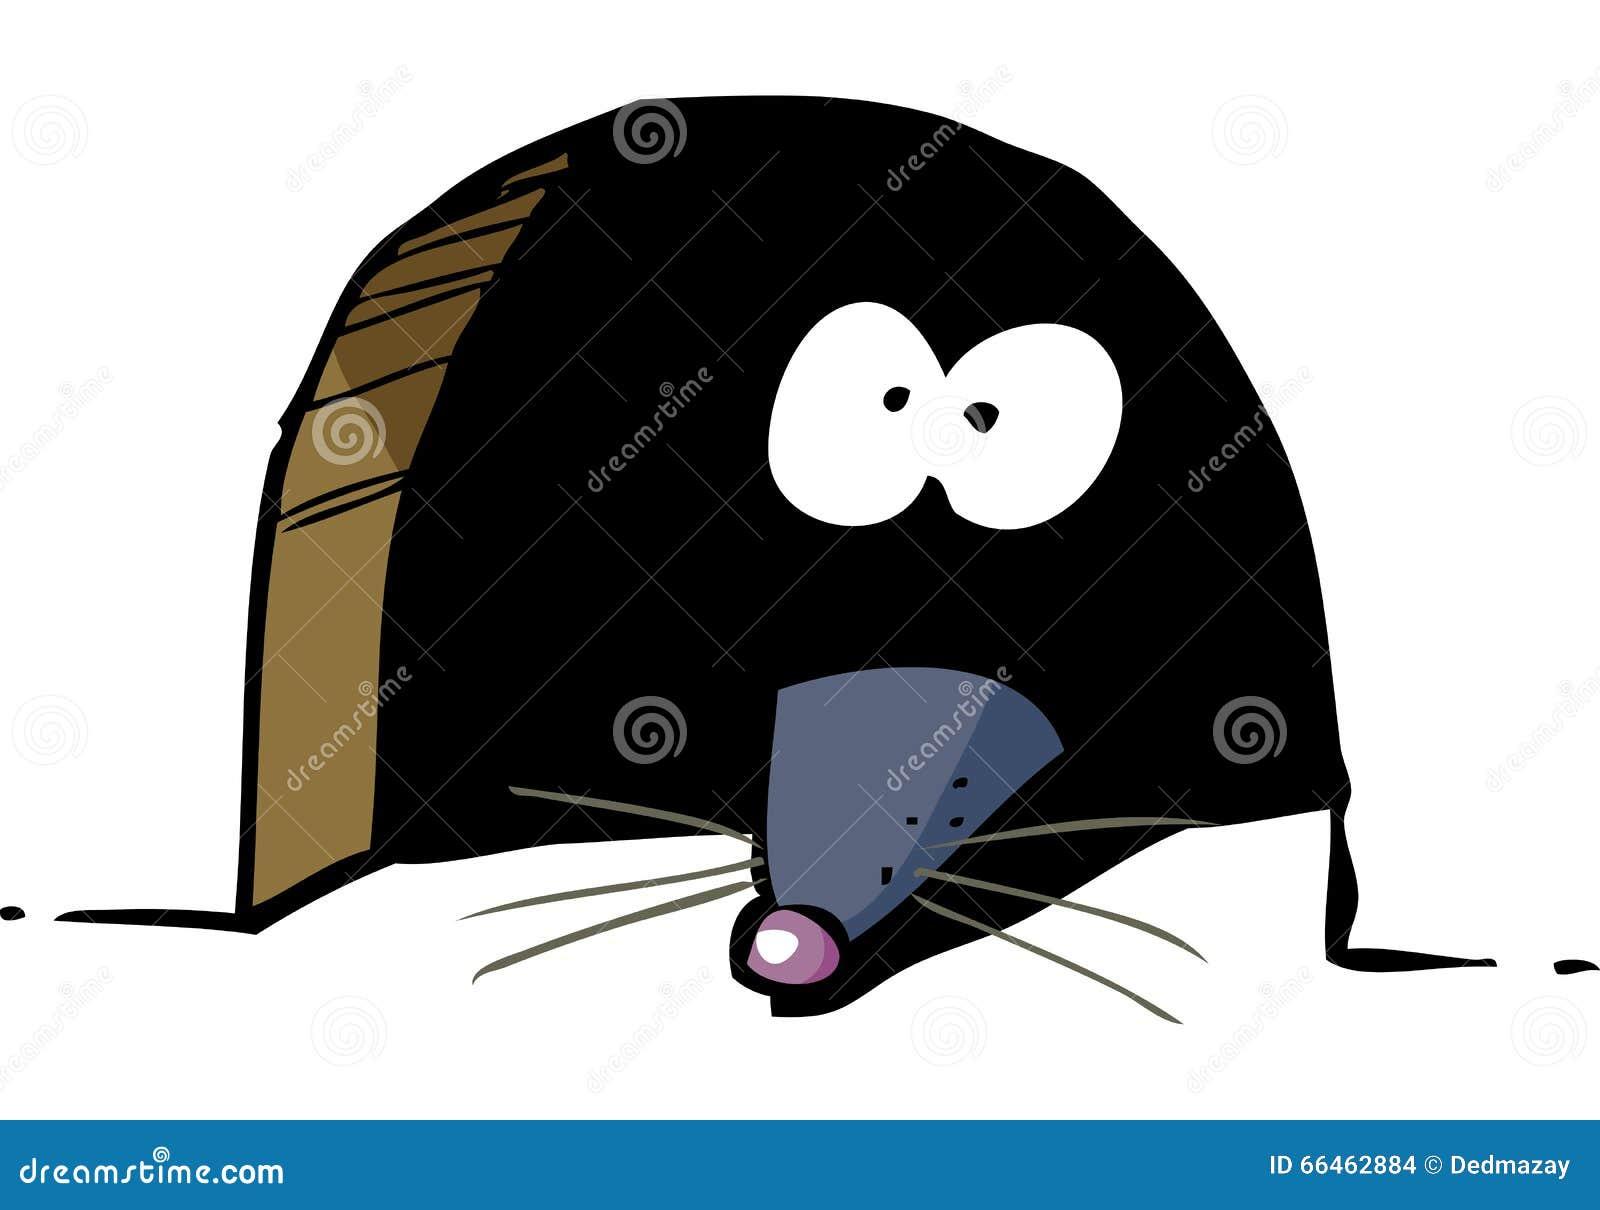 Rato no furo